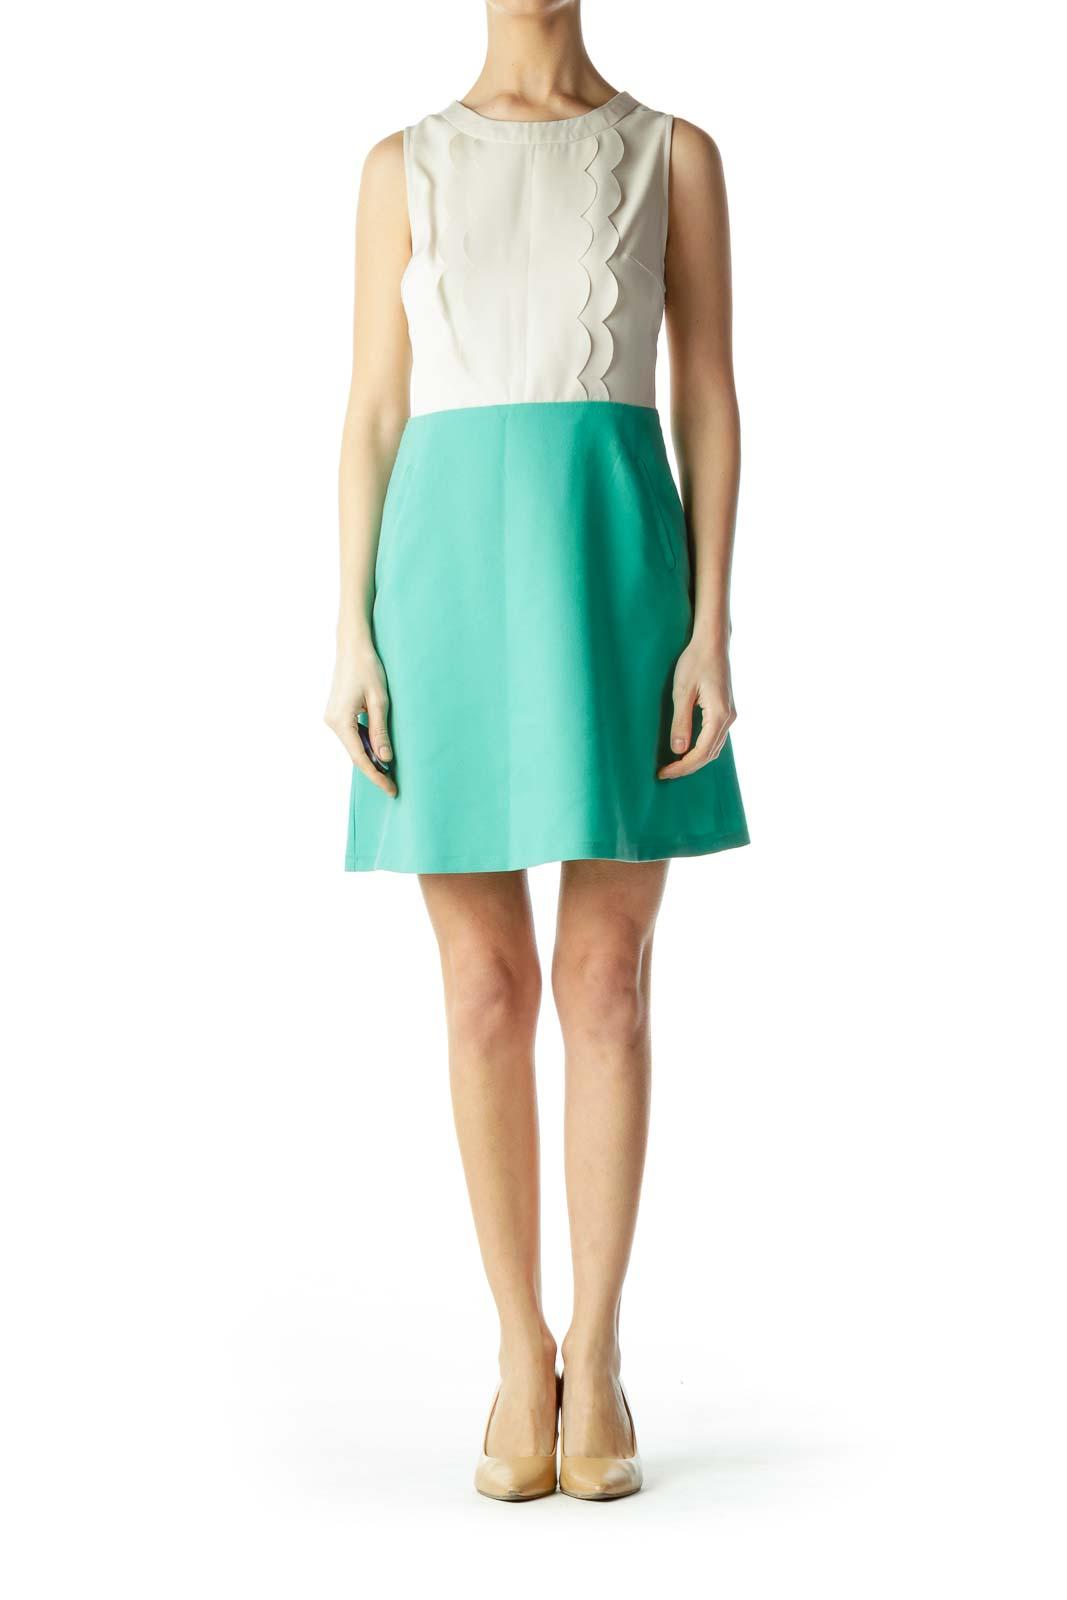 Beige and Mint Green Back Knit Dress